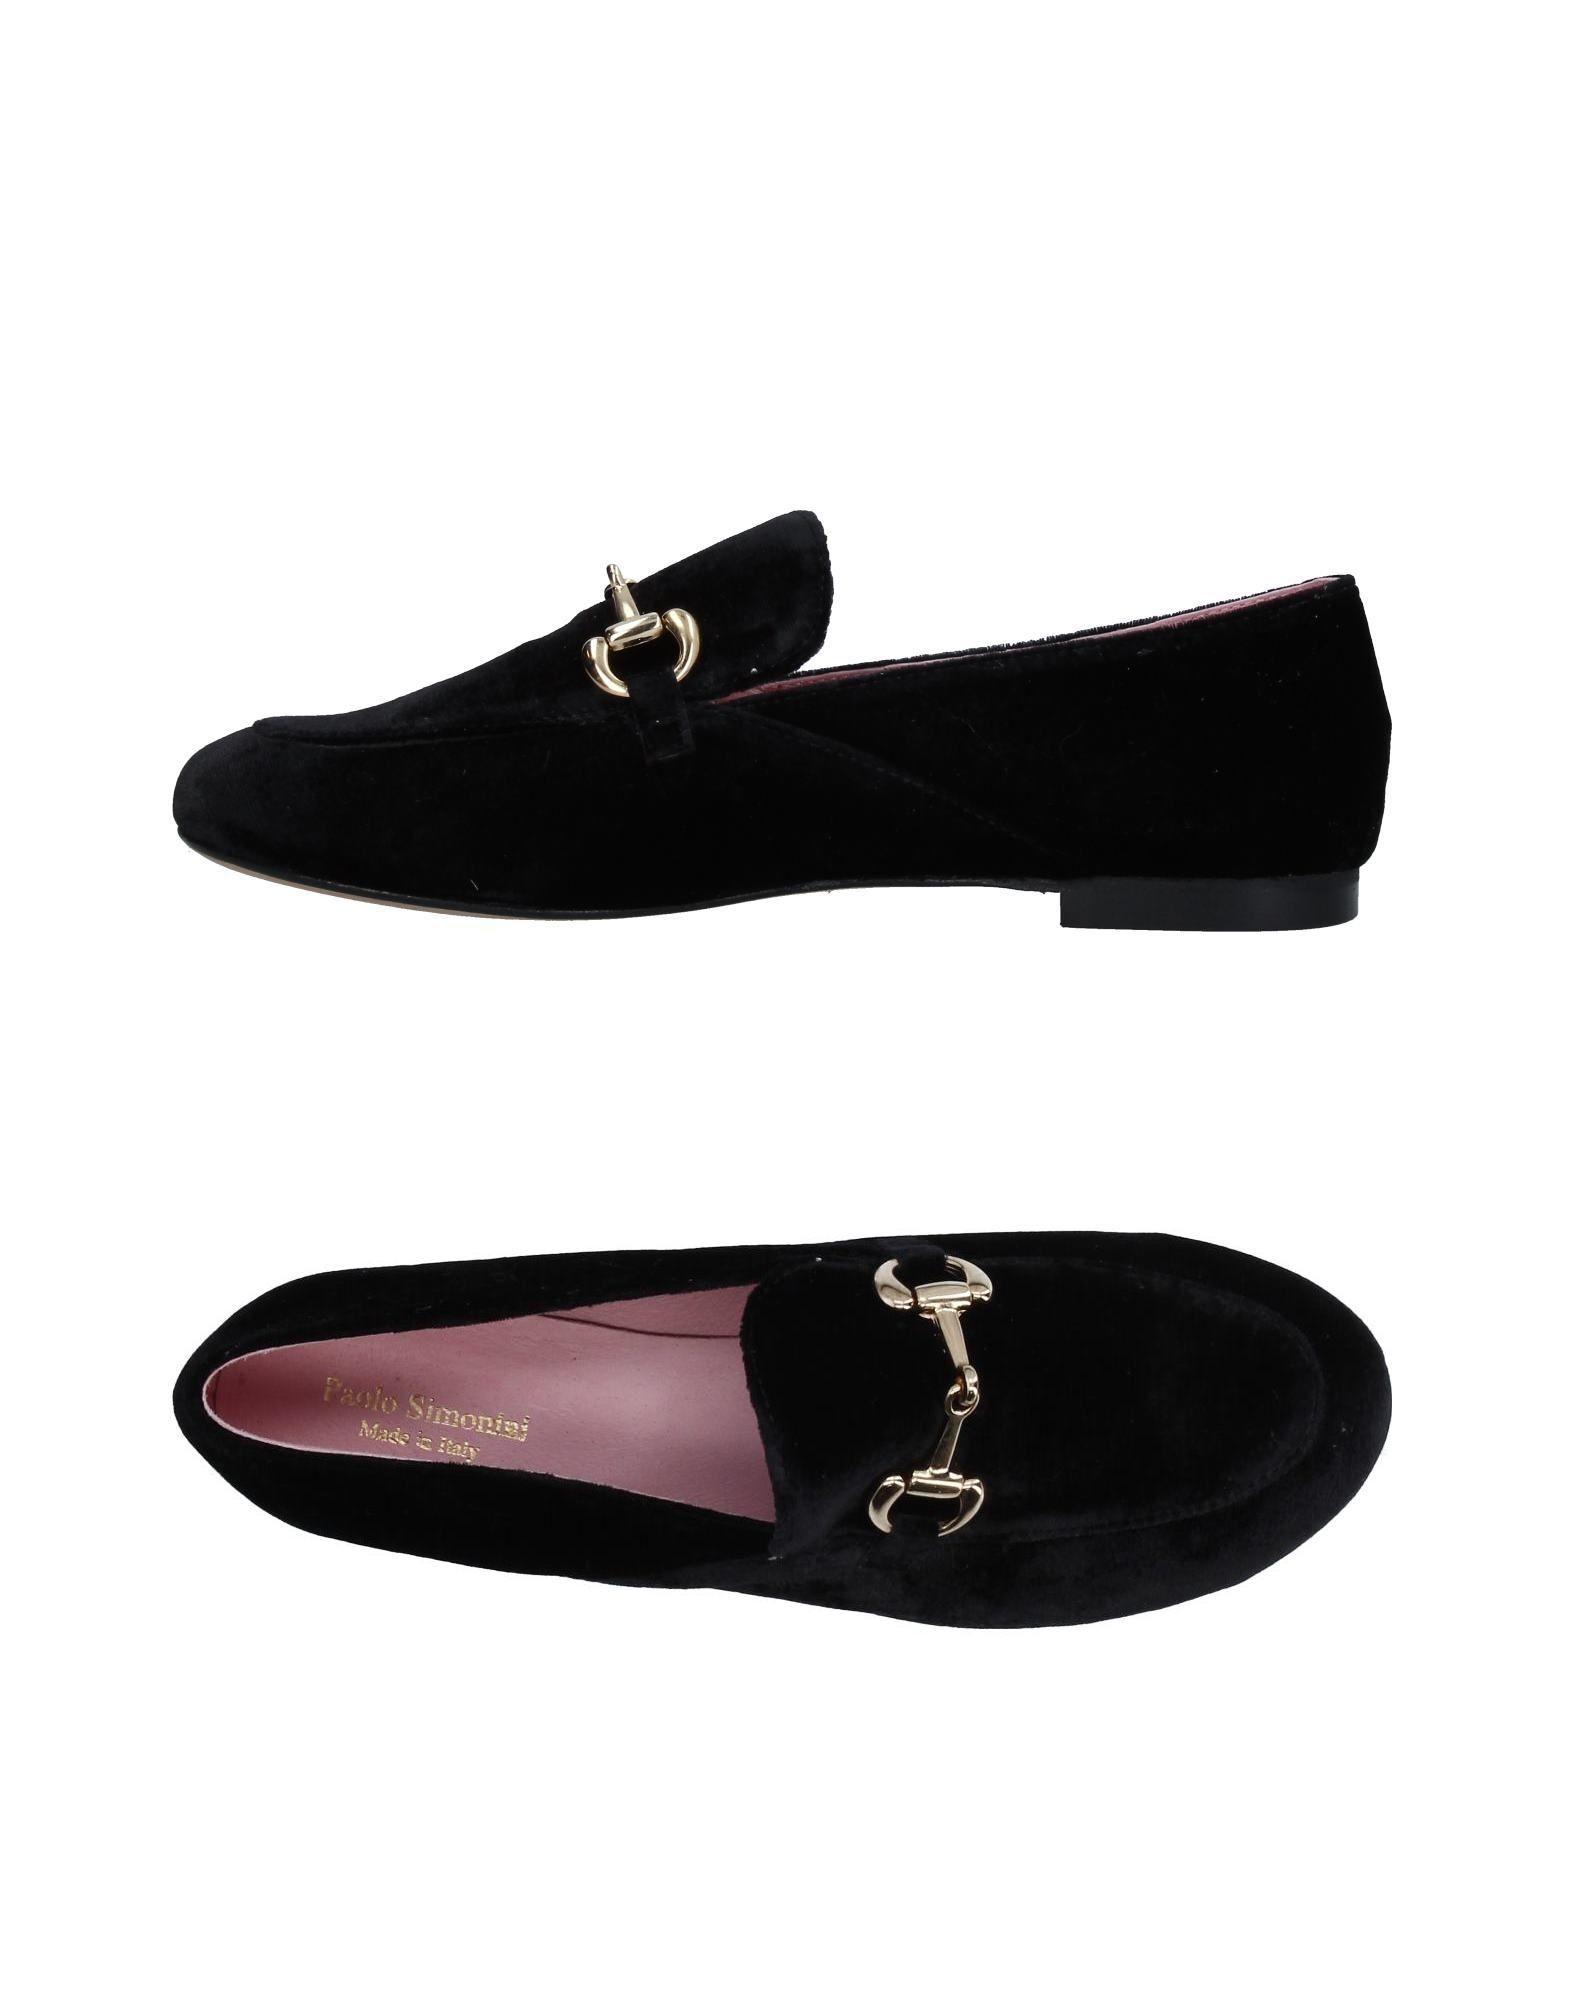 Paolo Simonini Mokassins Damen  11375809SJ Gute Qualität beliebte Schuhe